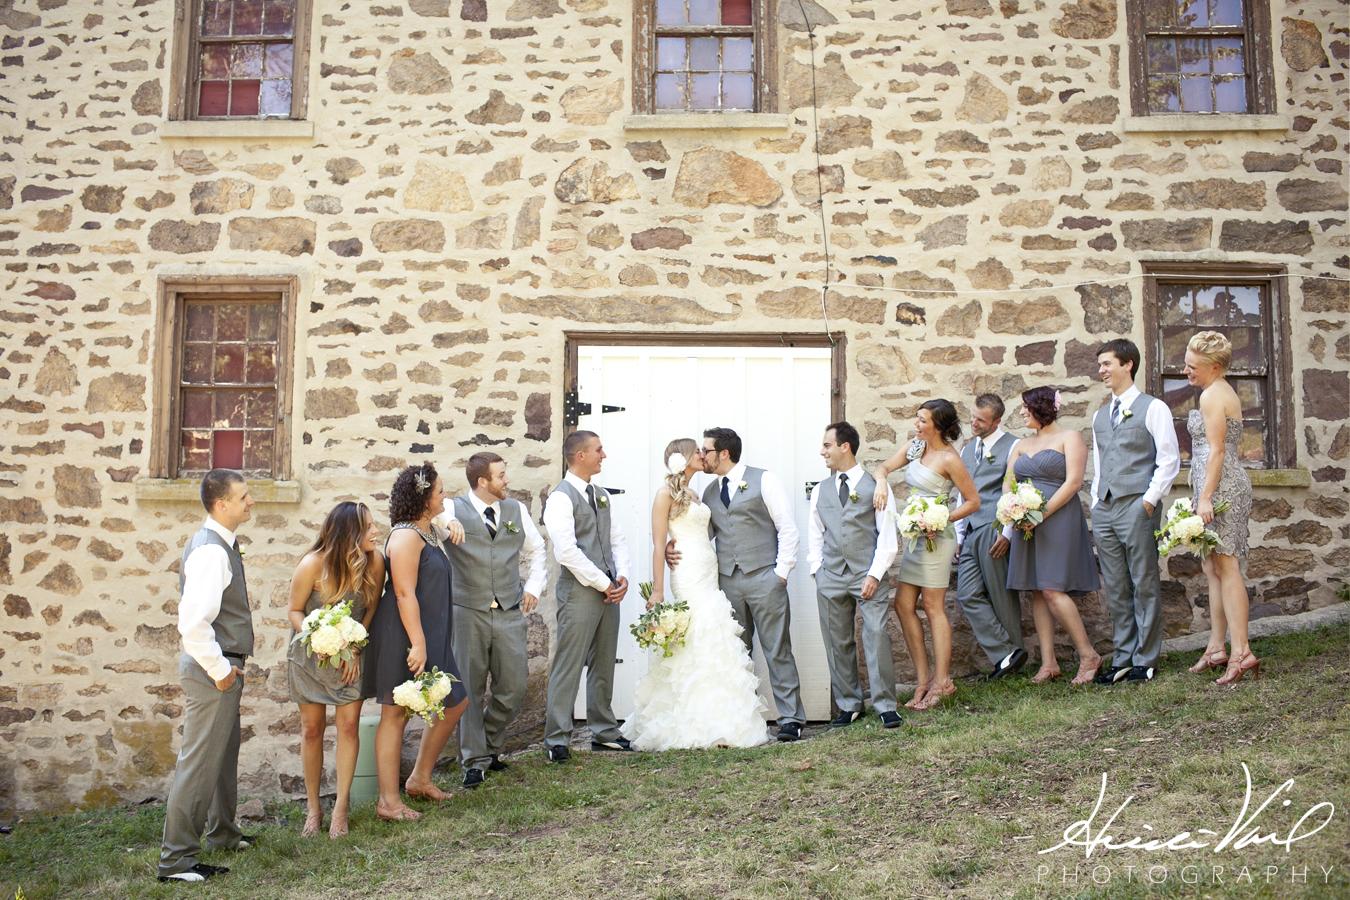 audubon barn weddings center events special pennsylvania party pa bridal summer john philadelphia venues partyspace lauren james ryan area winery